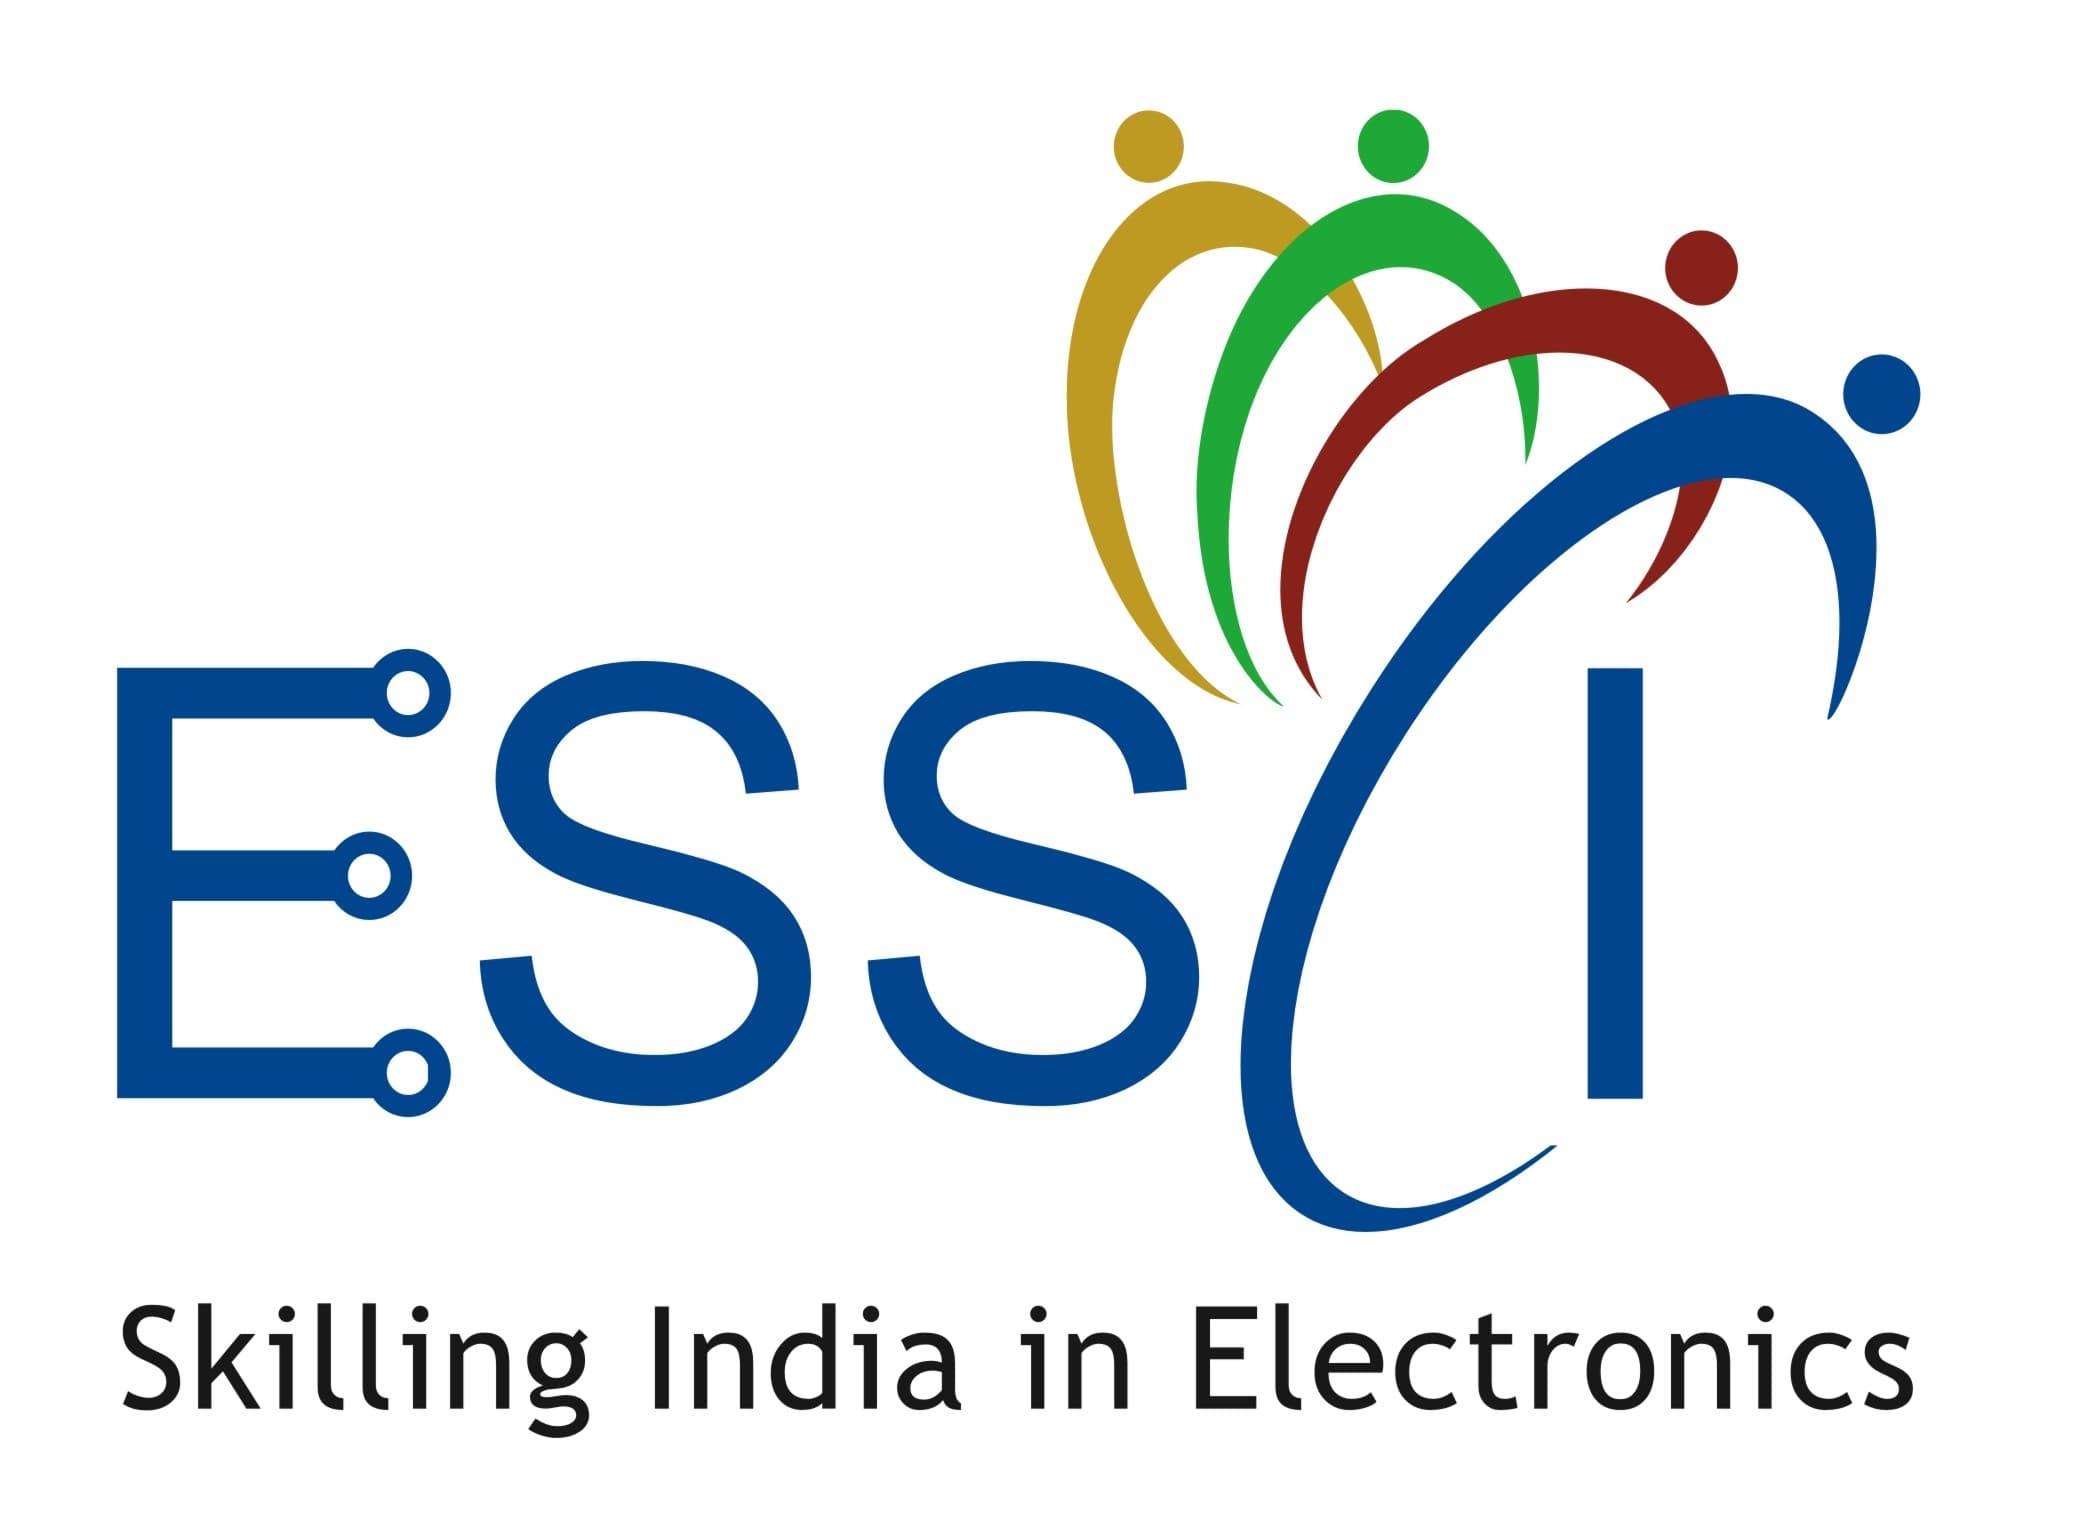 ESSCI skilling india in electronics